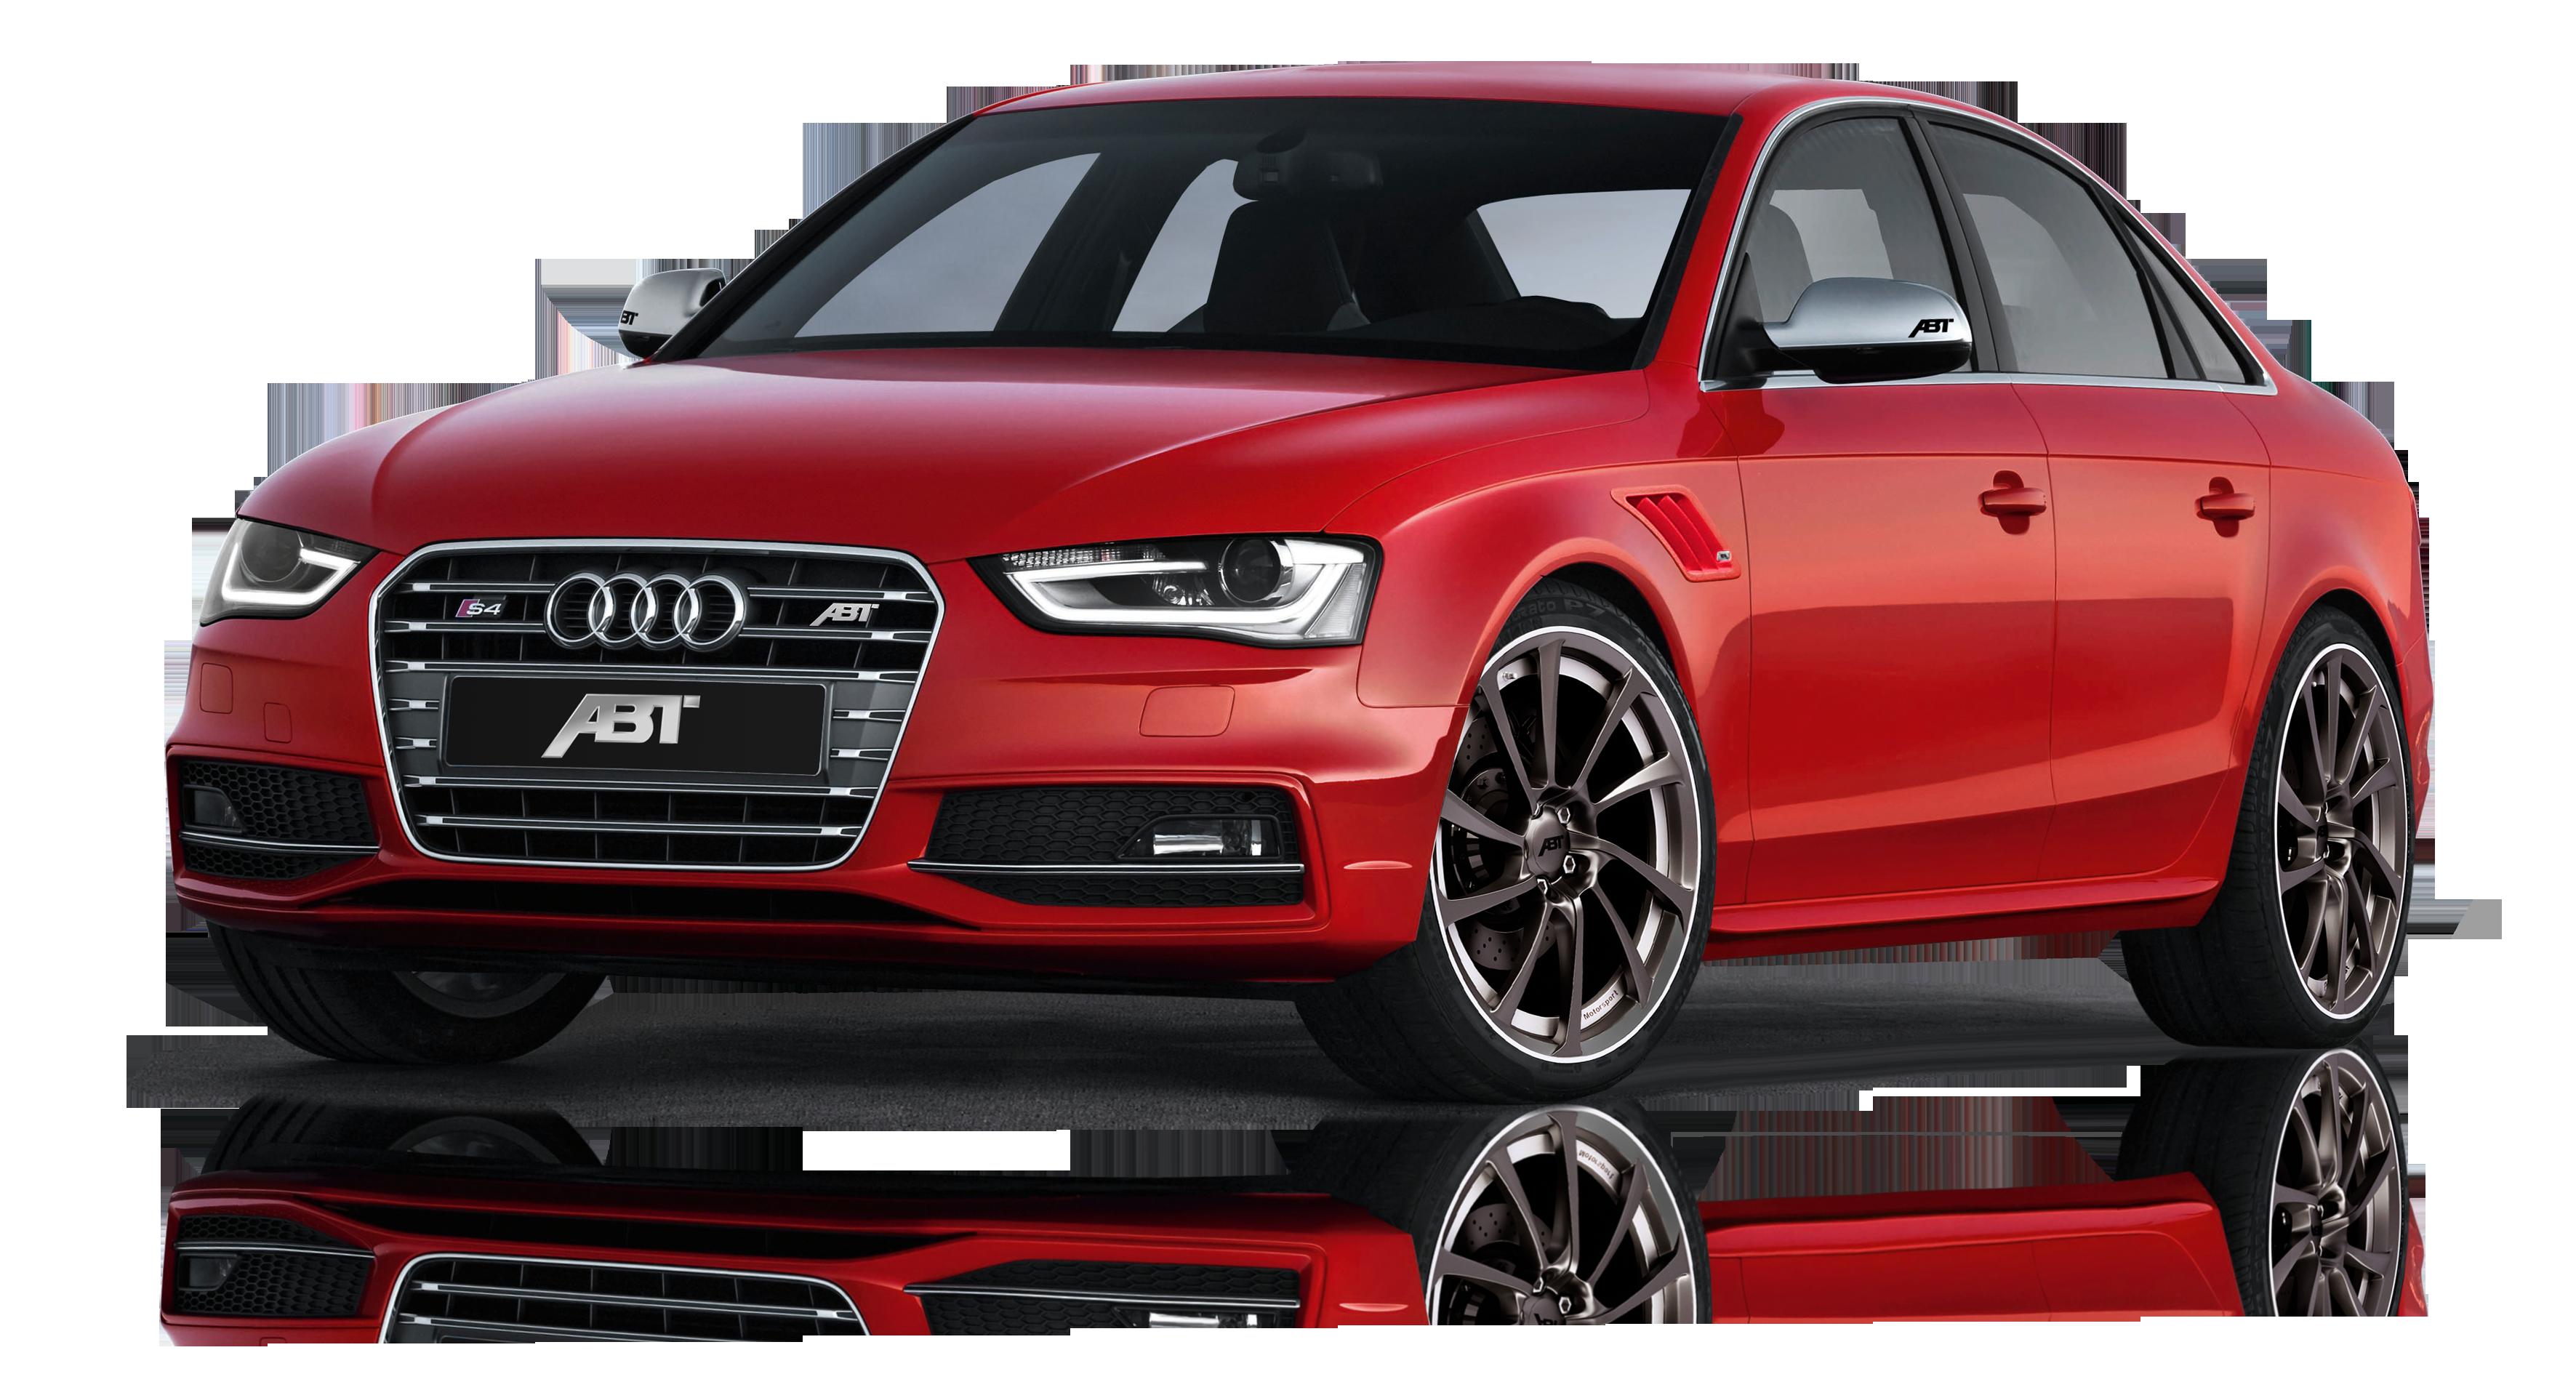 Audi Png Auto Car Image #16828 - Car, Transparent background PNG HD thumbnail